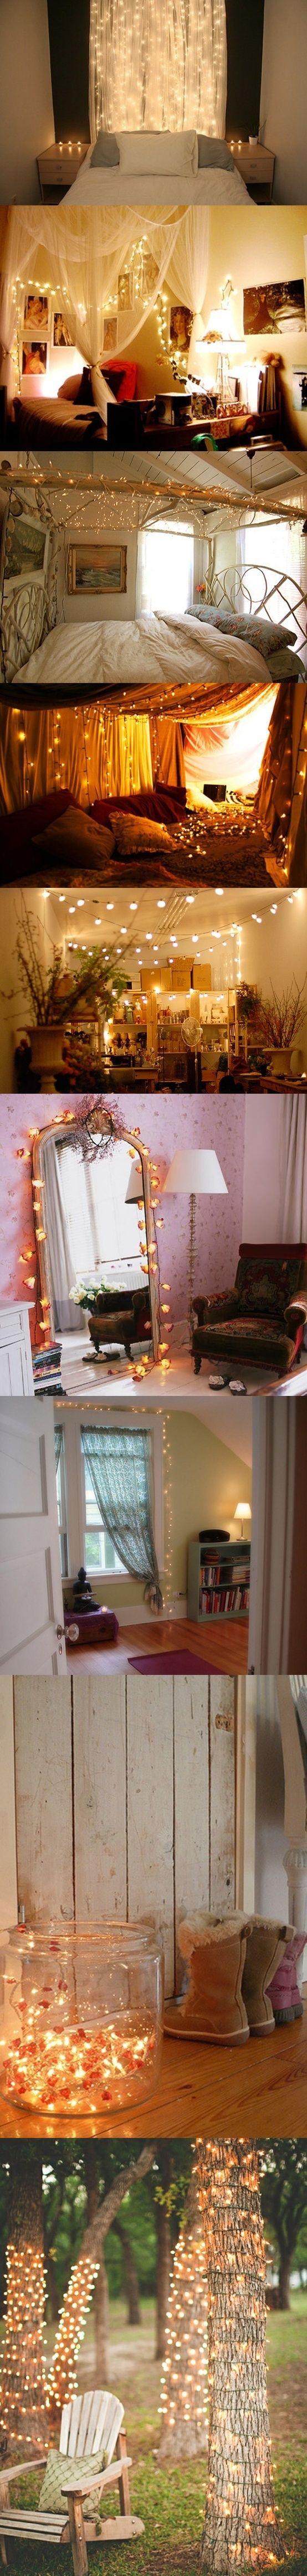 Christmas lights diy home decor pinterest string for Interior rope lighting ideas